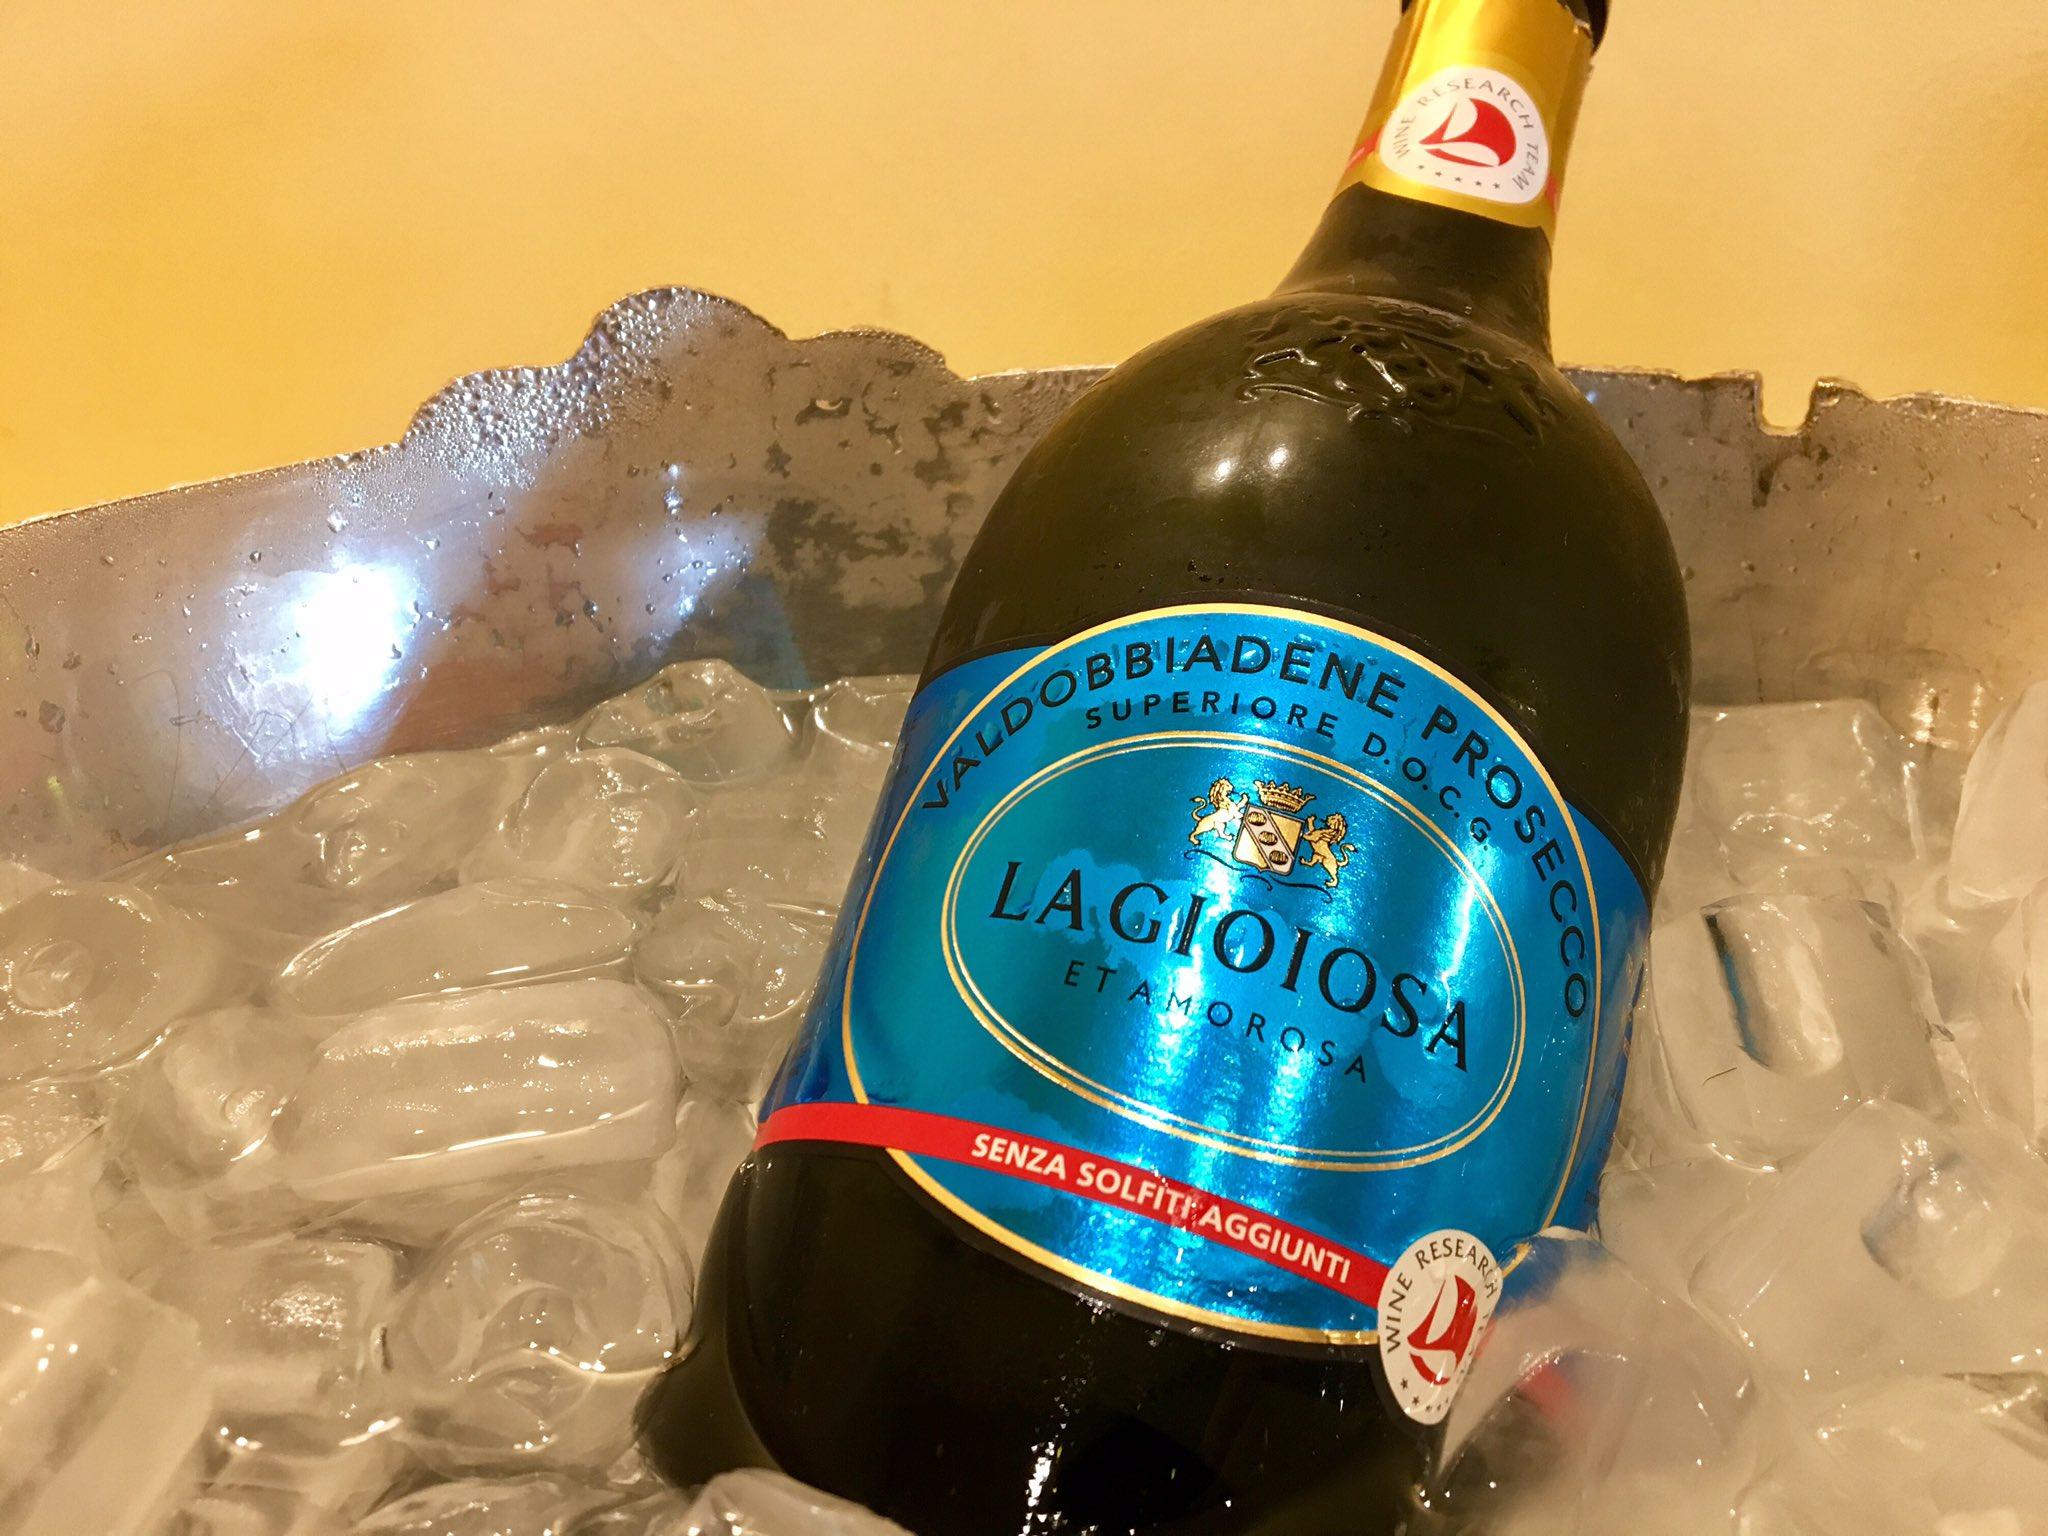 Il #winetasting del #WineResearchTeam: @LaGioiosa_it, #Gavelli, #Trequanda, #Pucciarelli, @FalescoOfficial, @LeonedeCastris, @LaGuardiense https://t.co/v6LEIngCQt